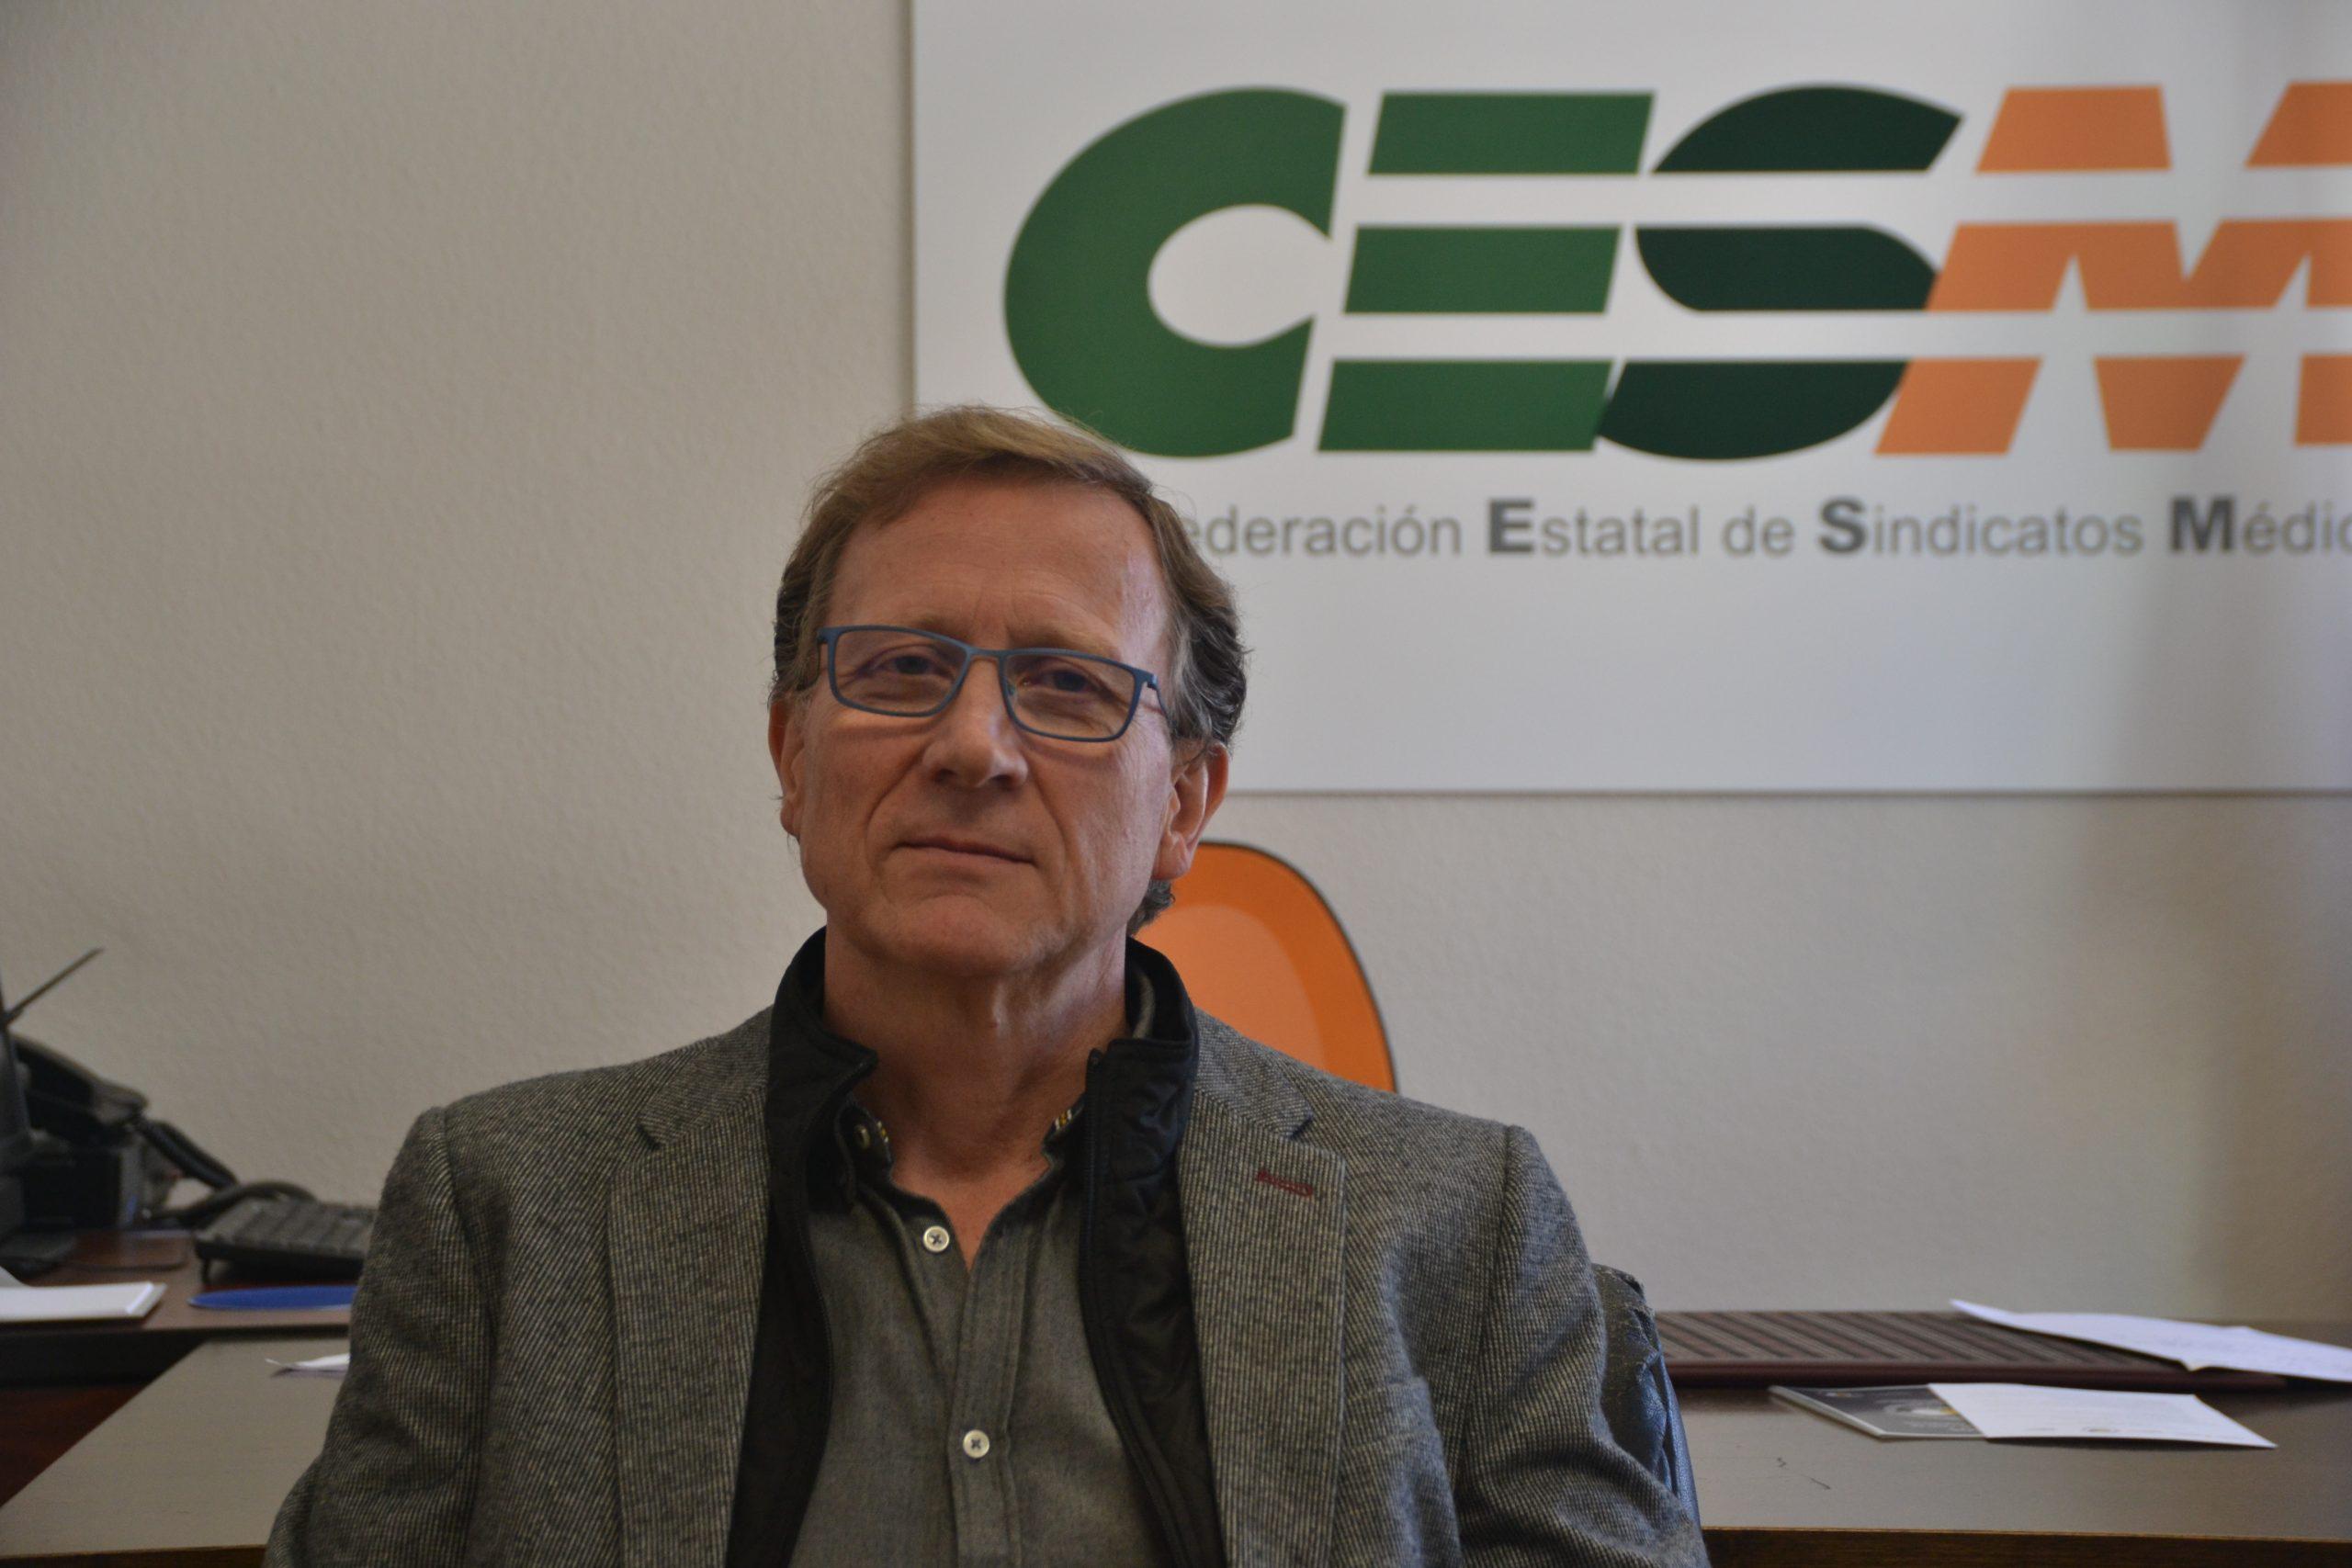 Responsable de CESM Prisiones